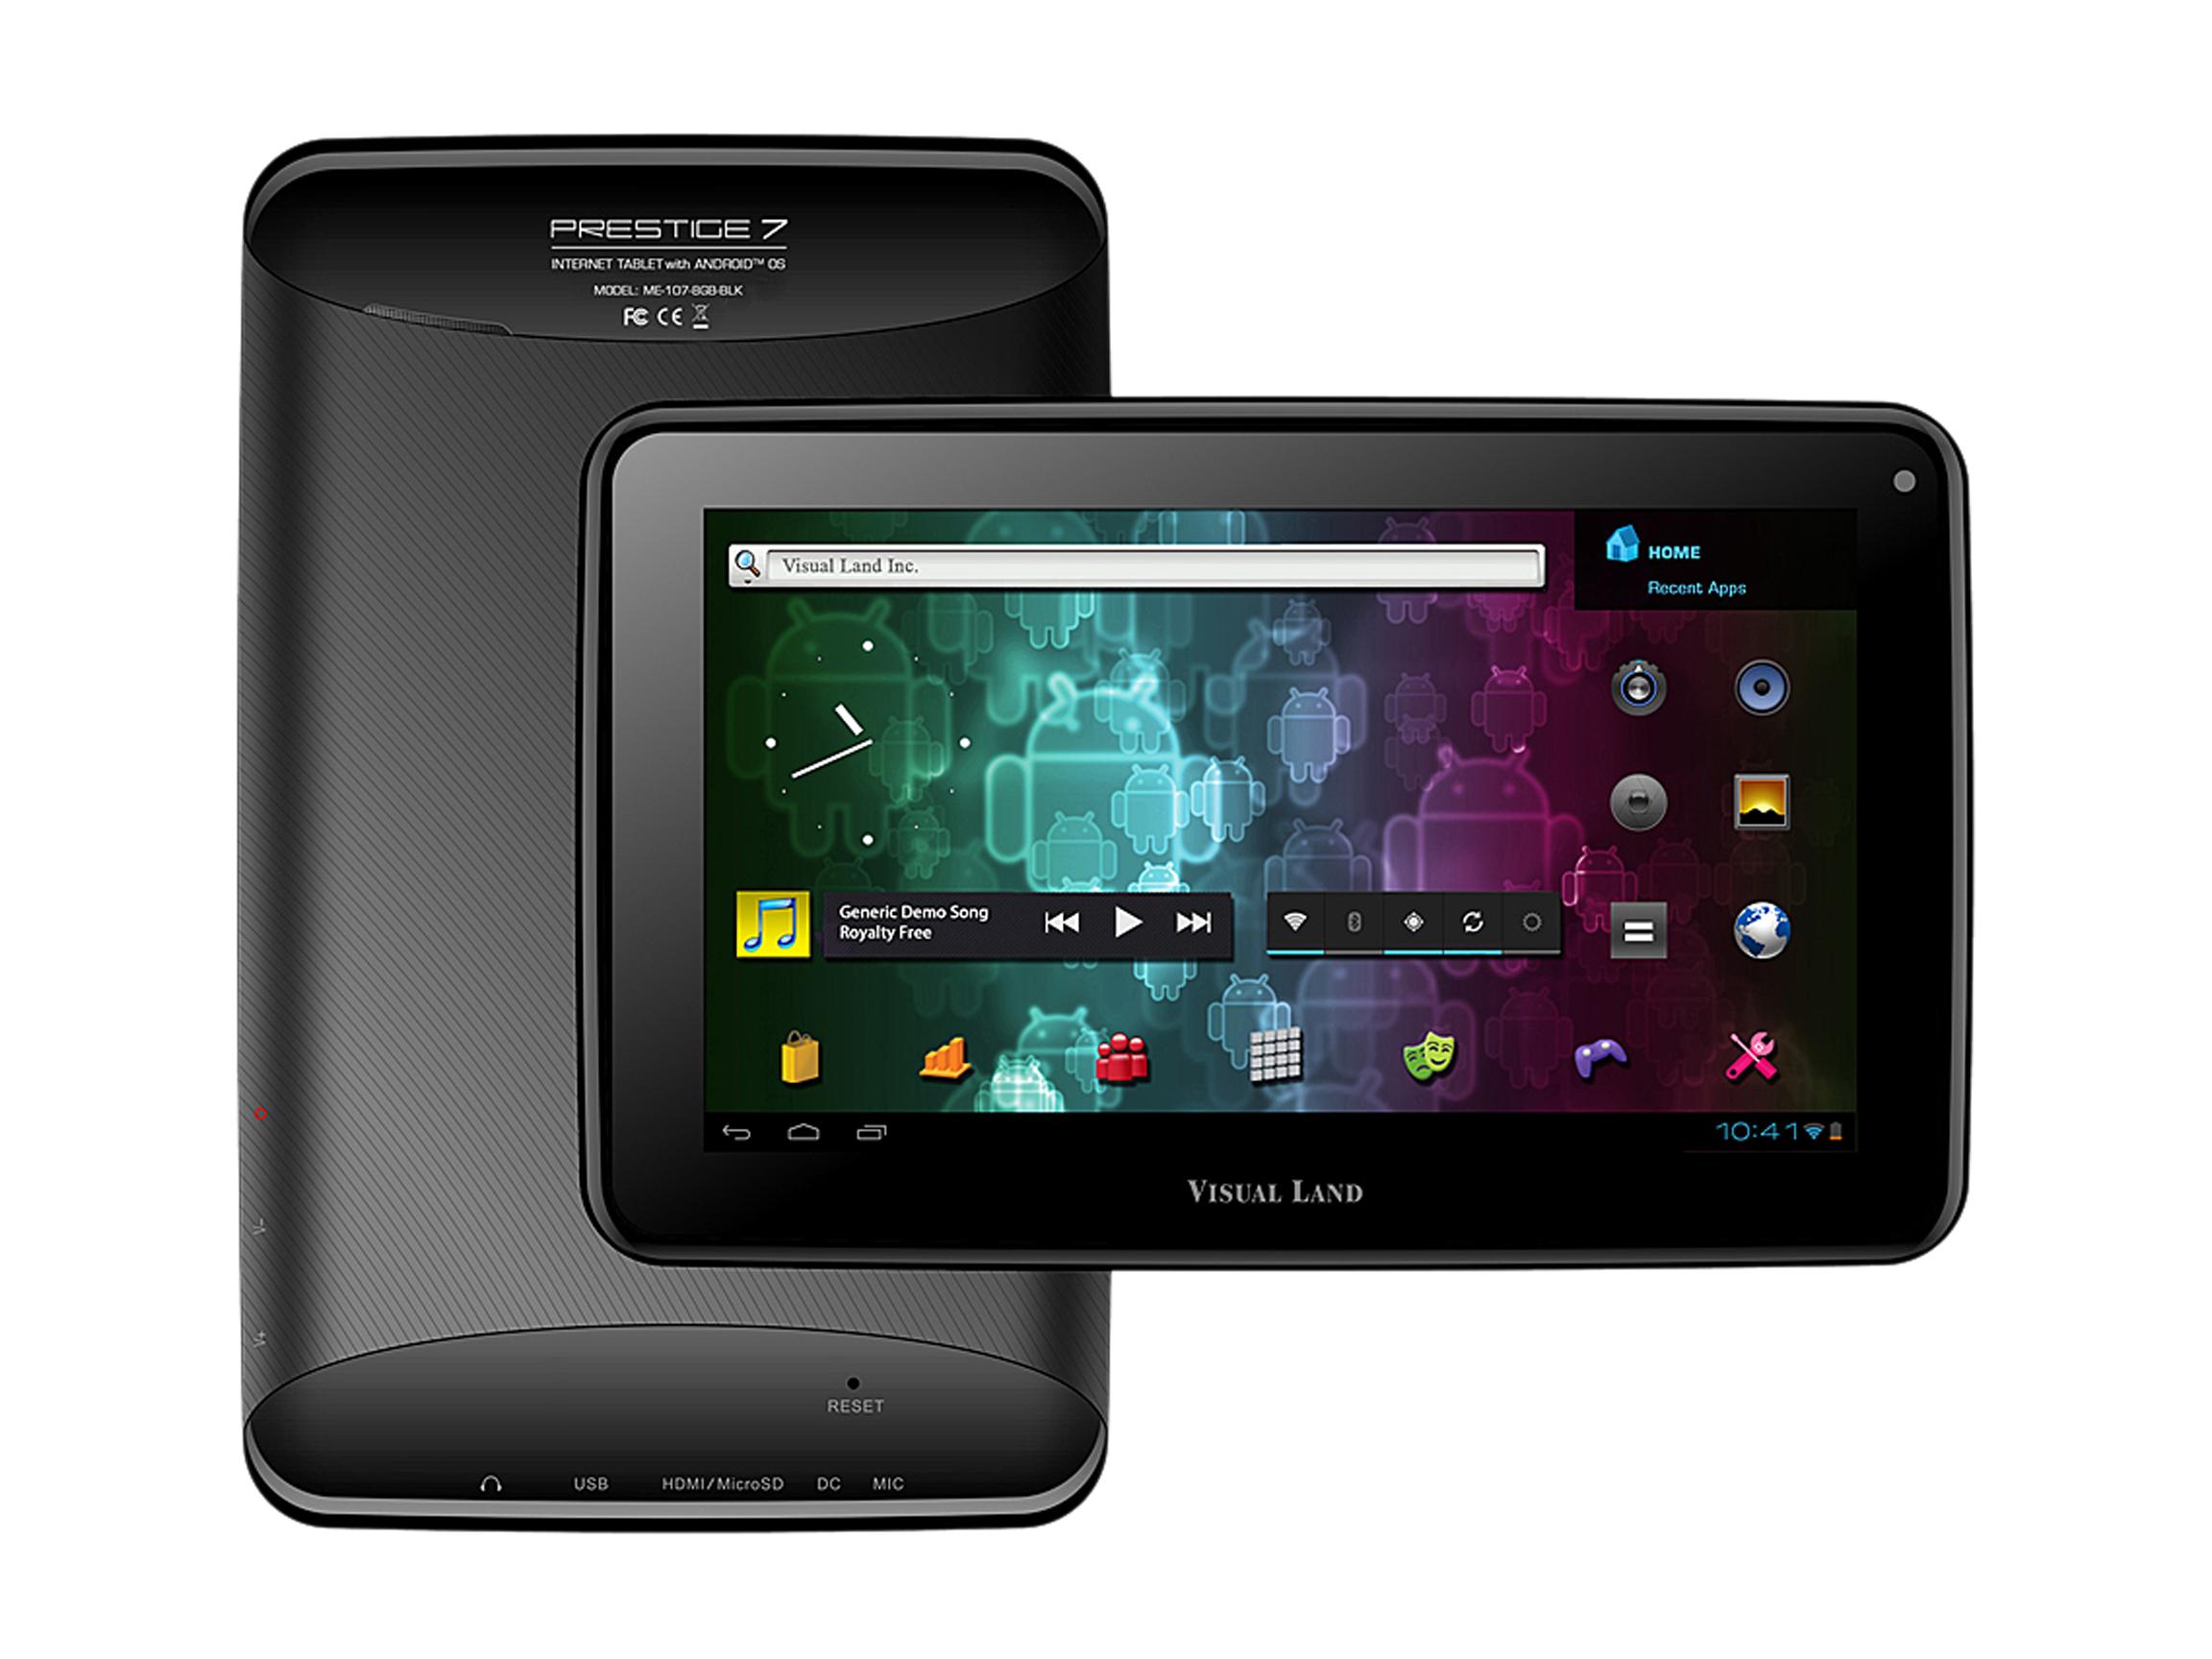 "Visual Land Prestige ME 107 8GB BLK ARM Cortex A8 512MB DDR3 RAM Memory 8GB Flash 7.0"" Internet Tablet (Black) Android 4.0 (Ice Cream Sandwich)"